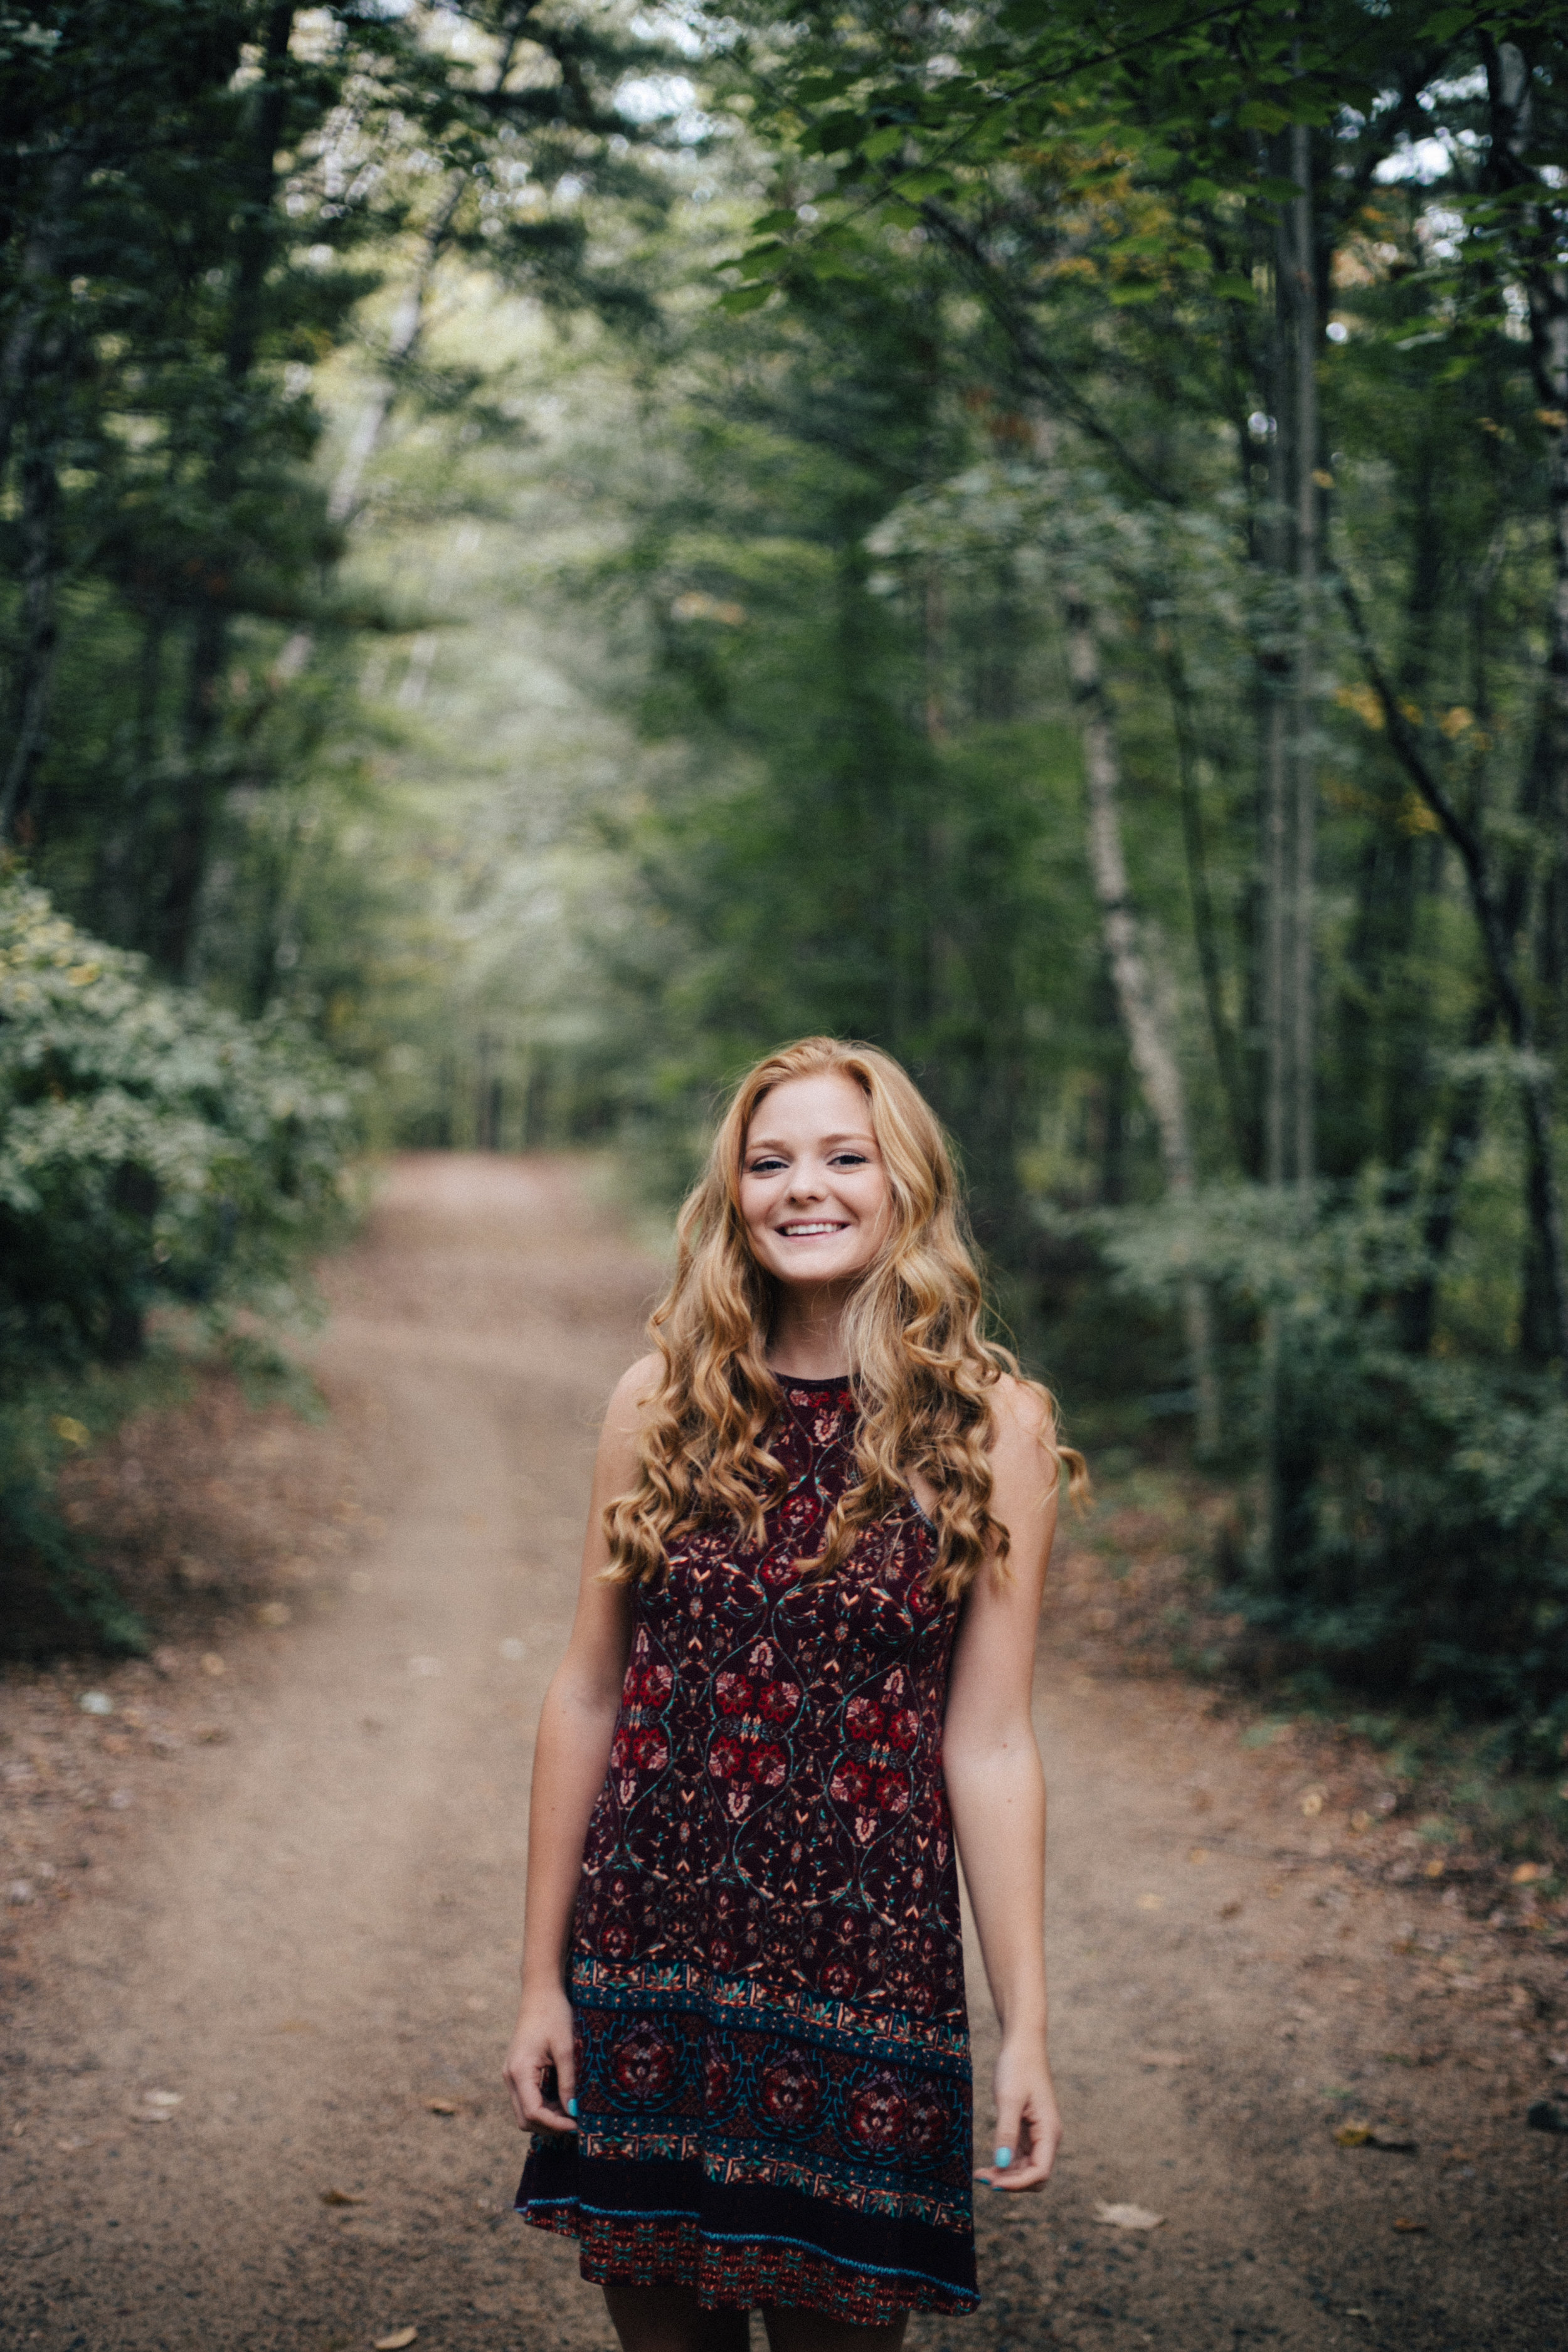 Unique outdoor high school senior portrait session by Britt DeZeeuw, Brainerd Minnesota photographer